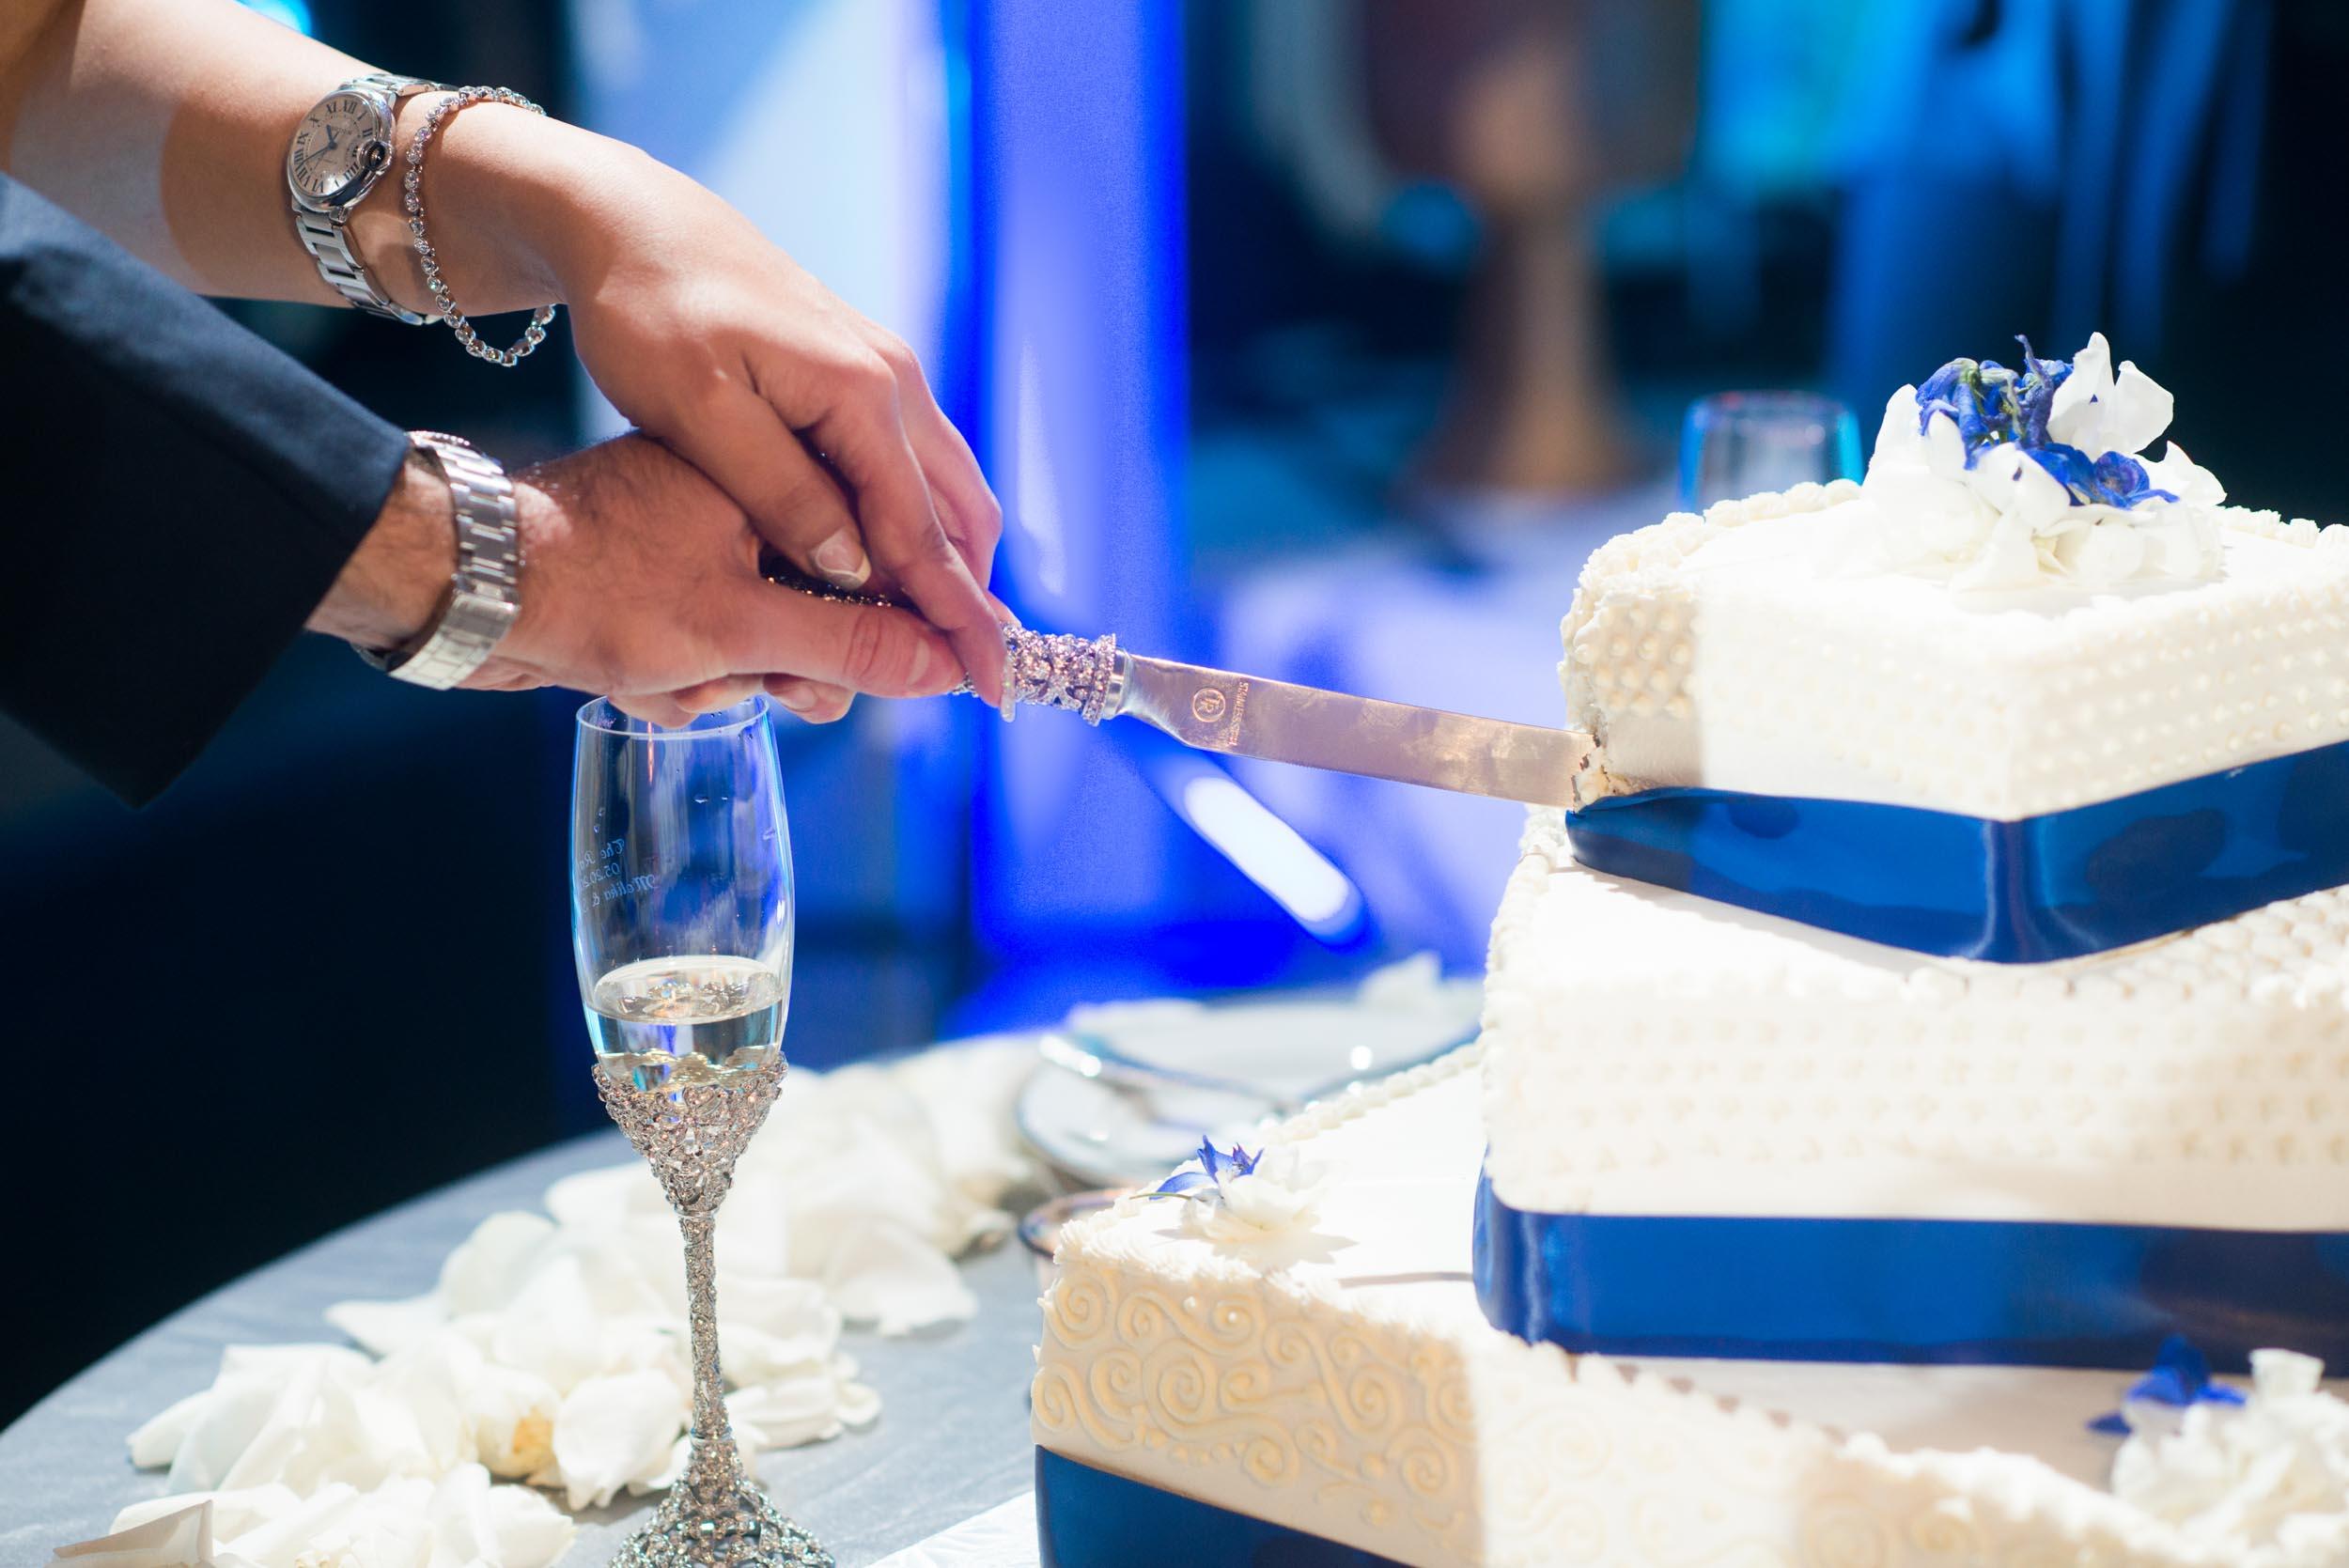 dc+metro+wedding+photographer+vadym+guliuk+photography+wedding+cake-cutting-2027.jpg